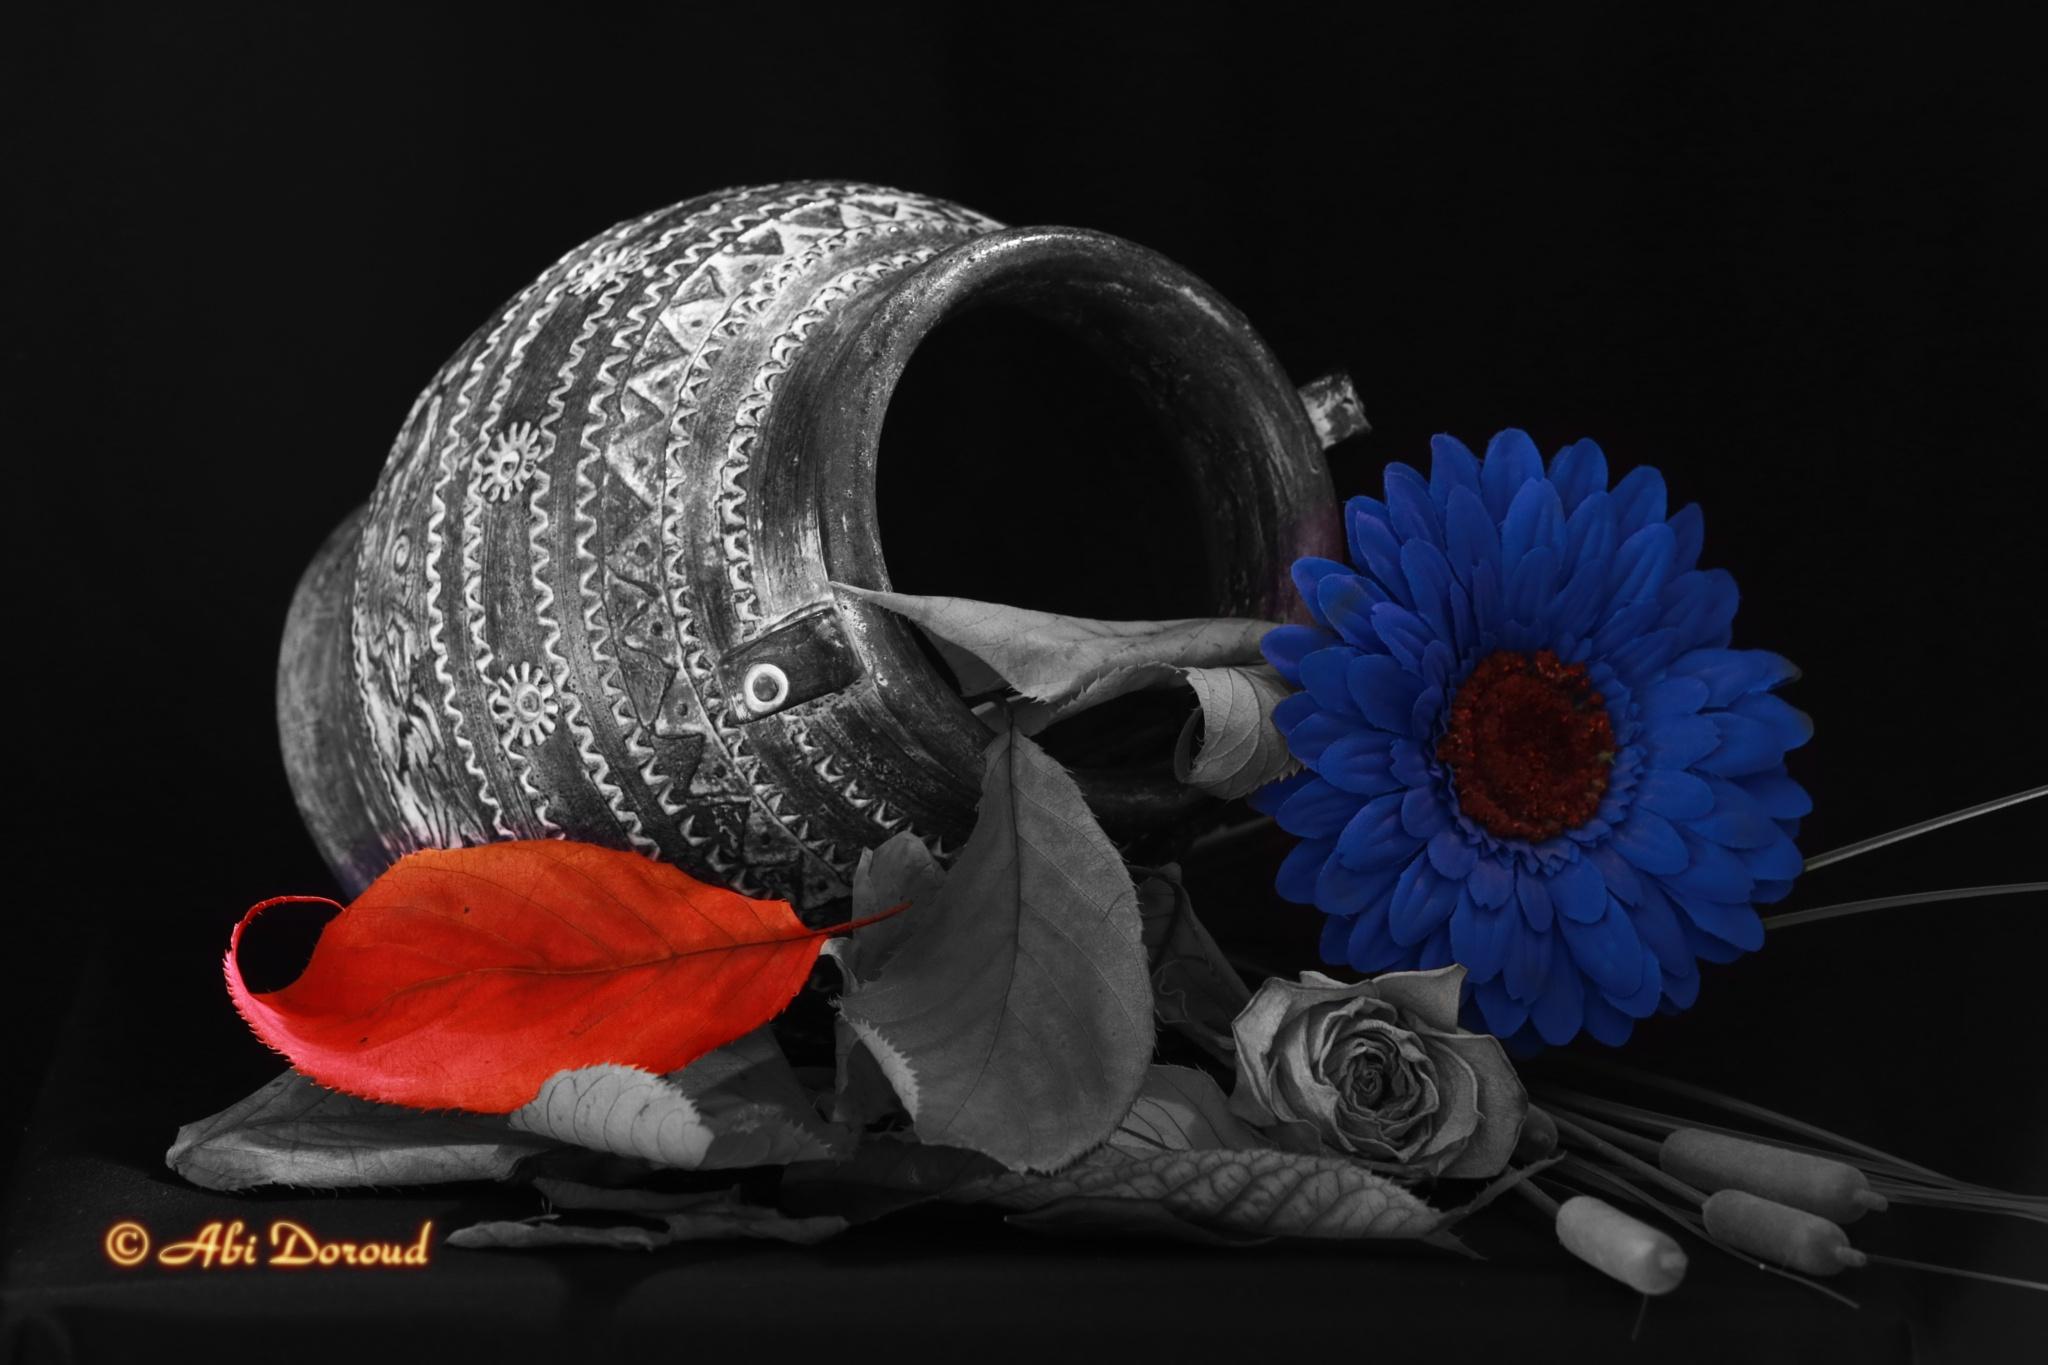 The darkness in November by abi.doroud